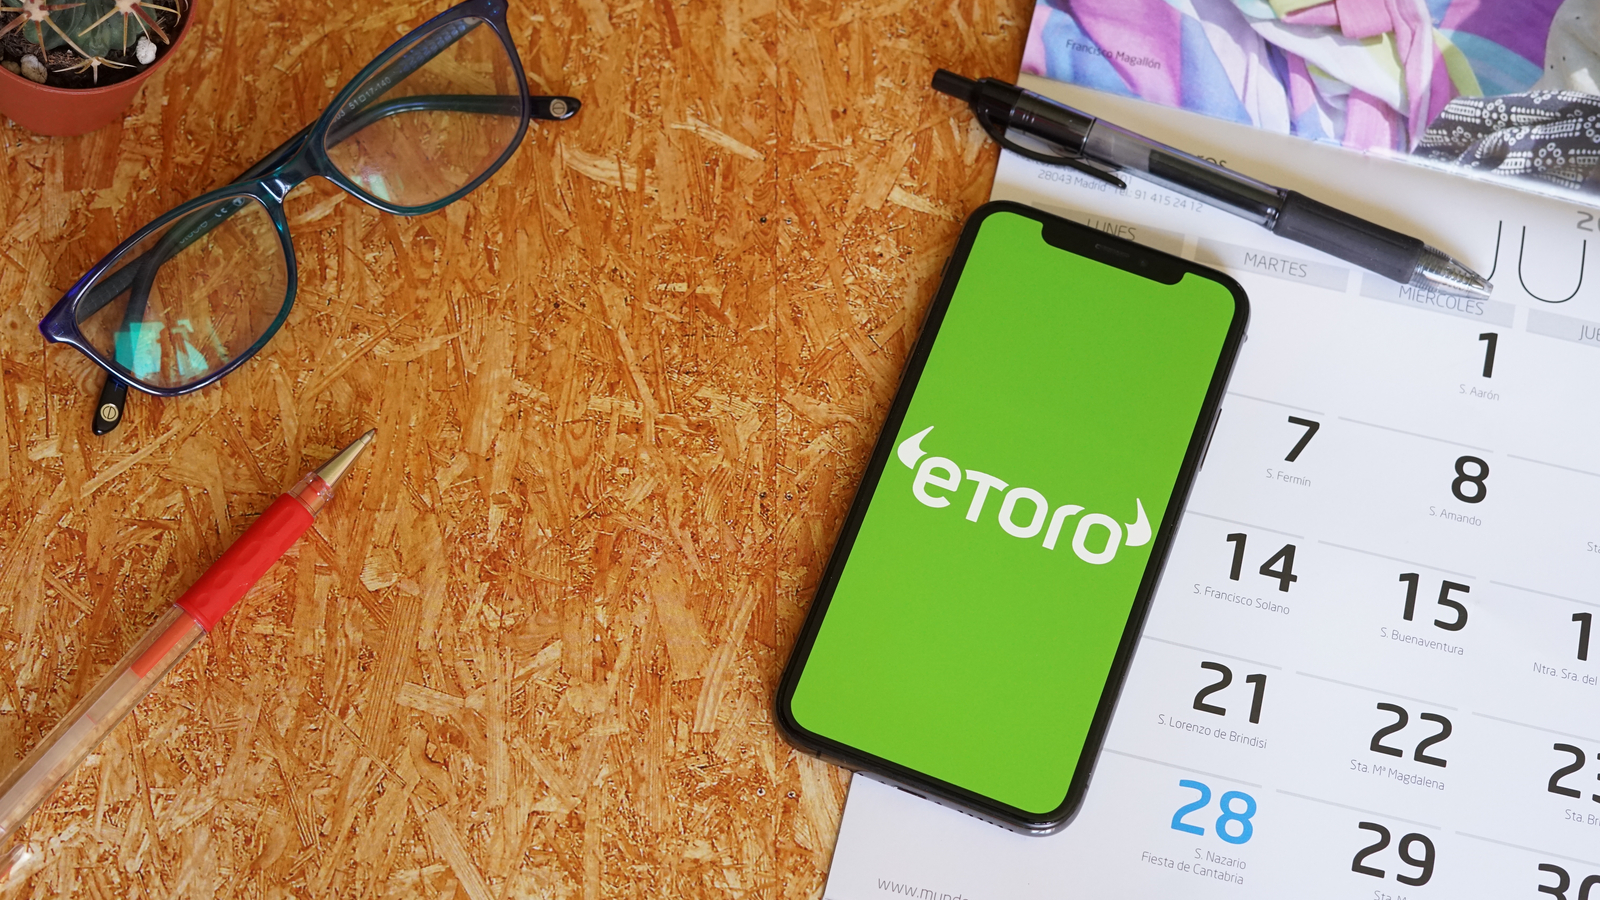 Defi crypto - 7 Cryptos in eToro's DeFi Portfolio That Should Do Well Over the Next Year